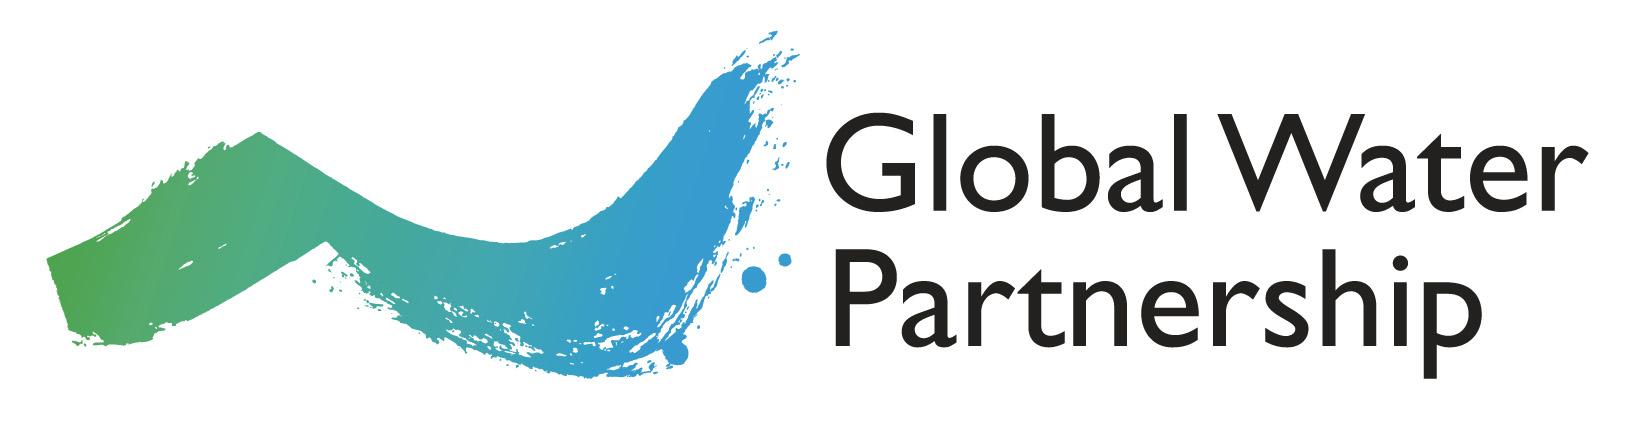 logo for Global Water Partnership